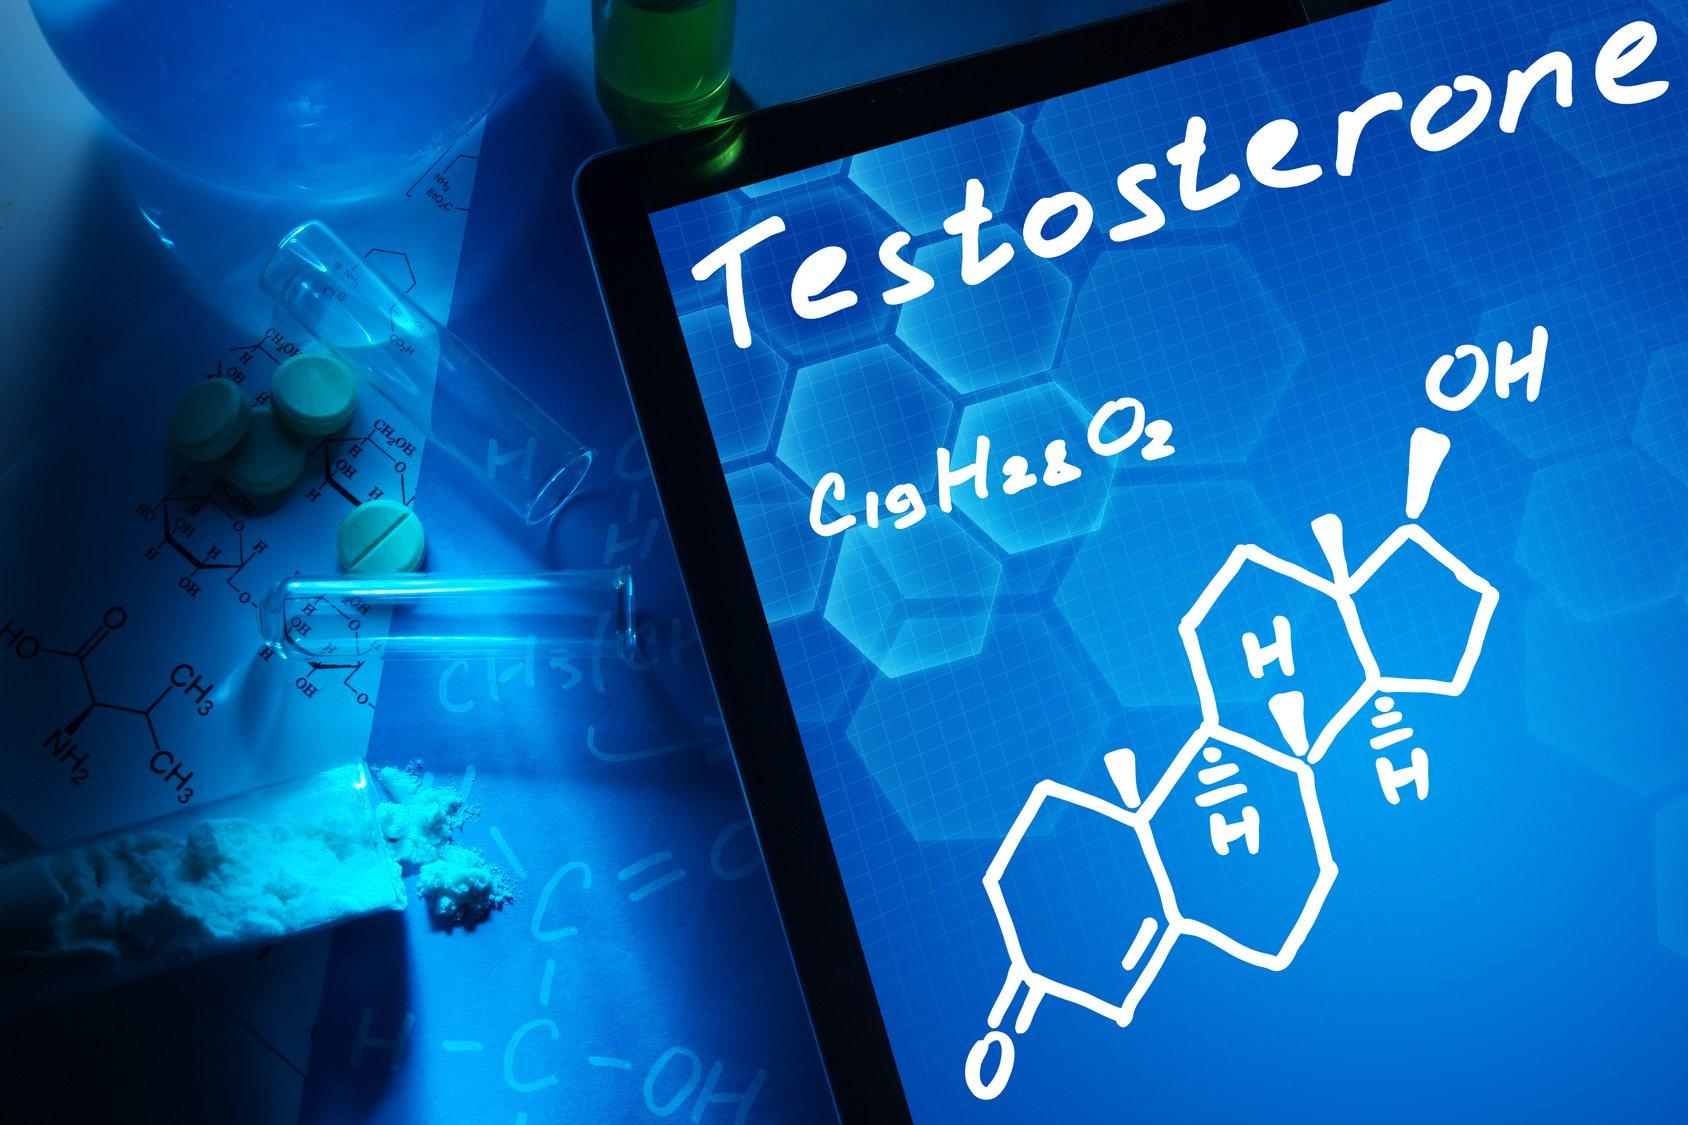 Cholesterin und Testosteron